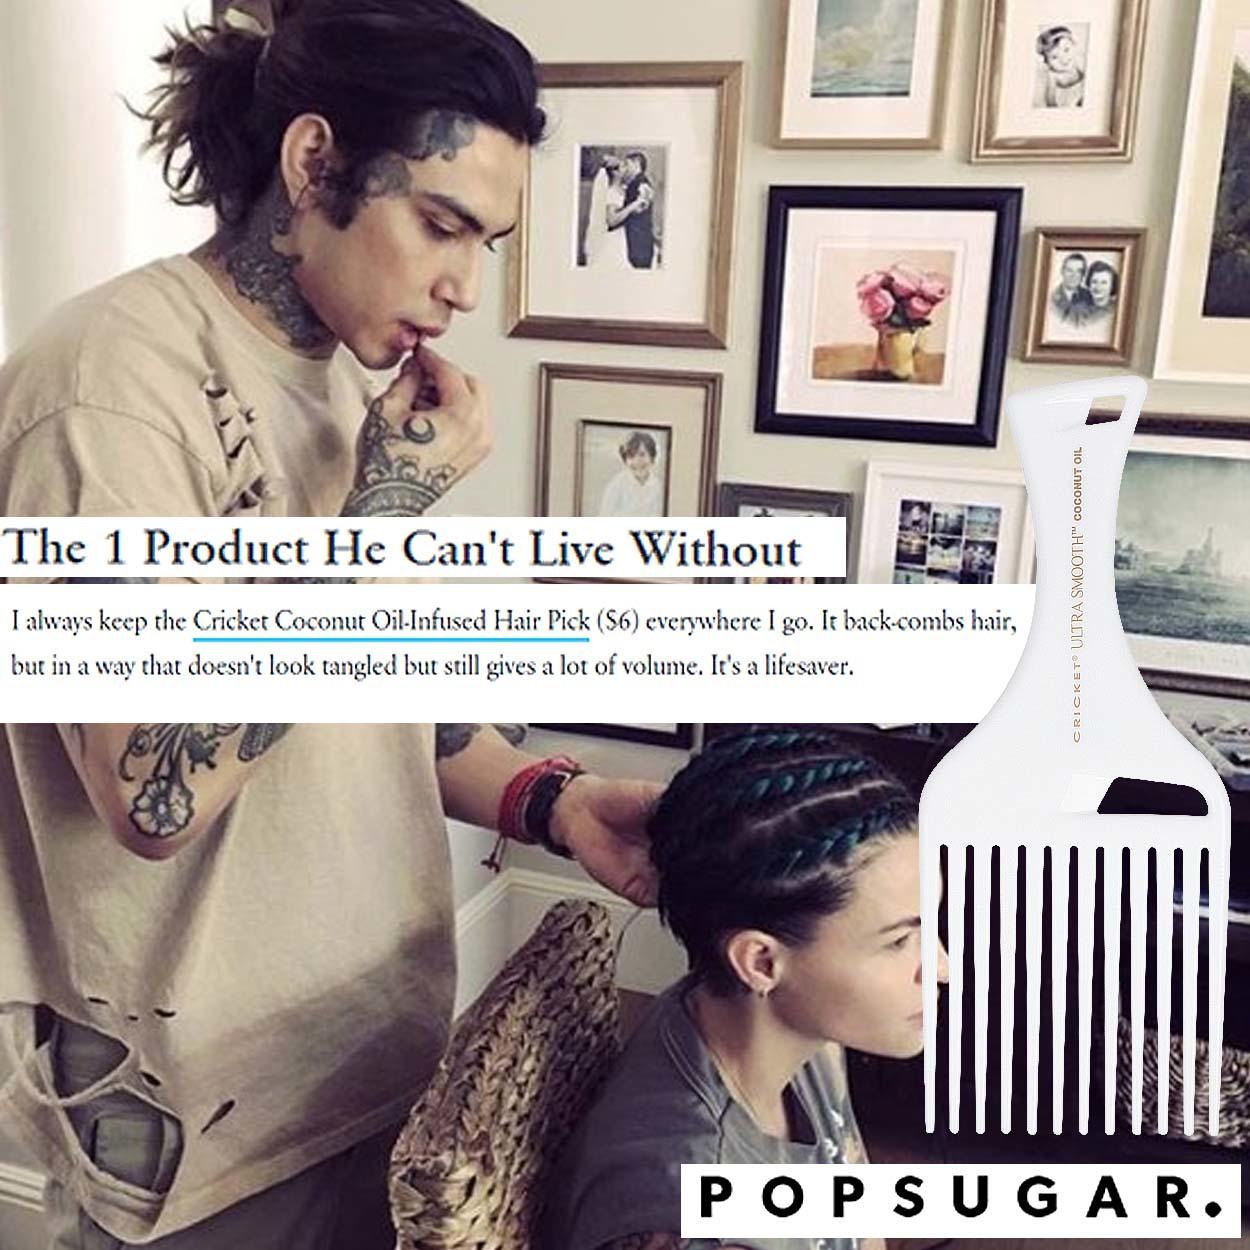 2018.7.2-popsugar.celebrity-hairstylist.ultrasmooth-cc-combs-pg2-03051.jpg